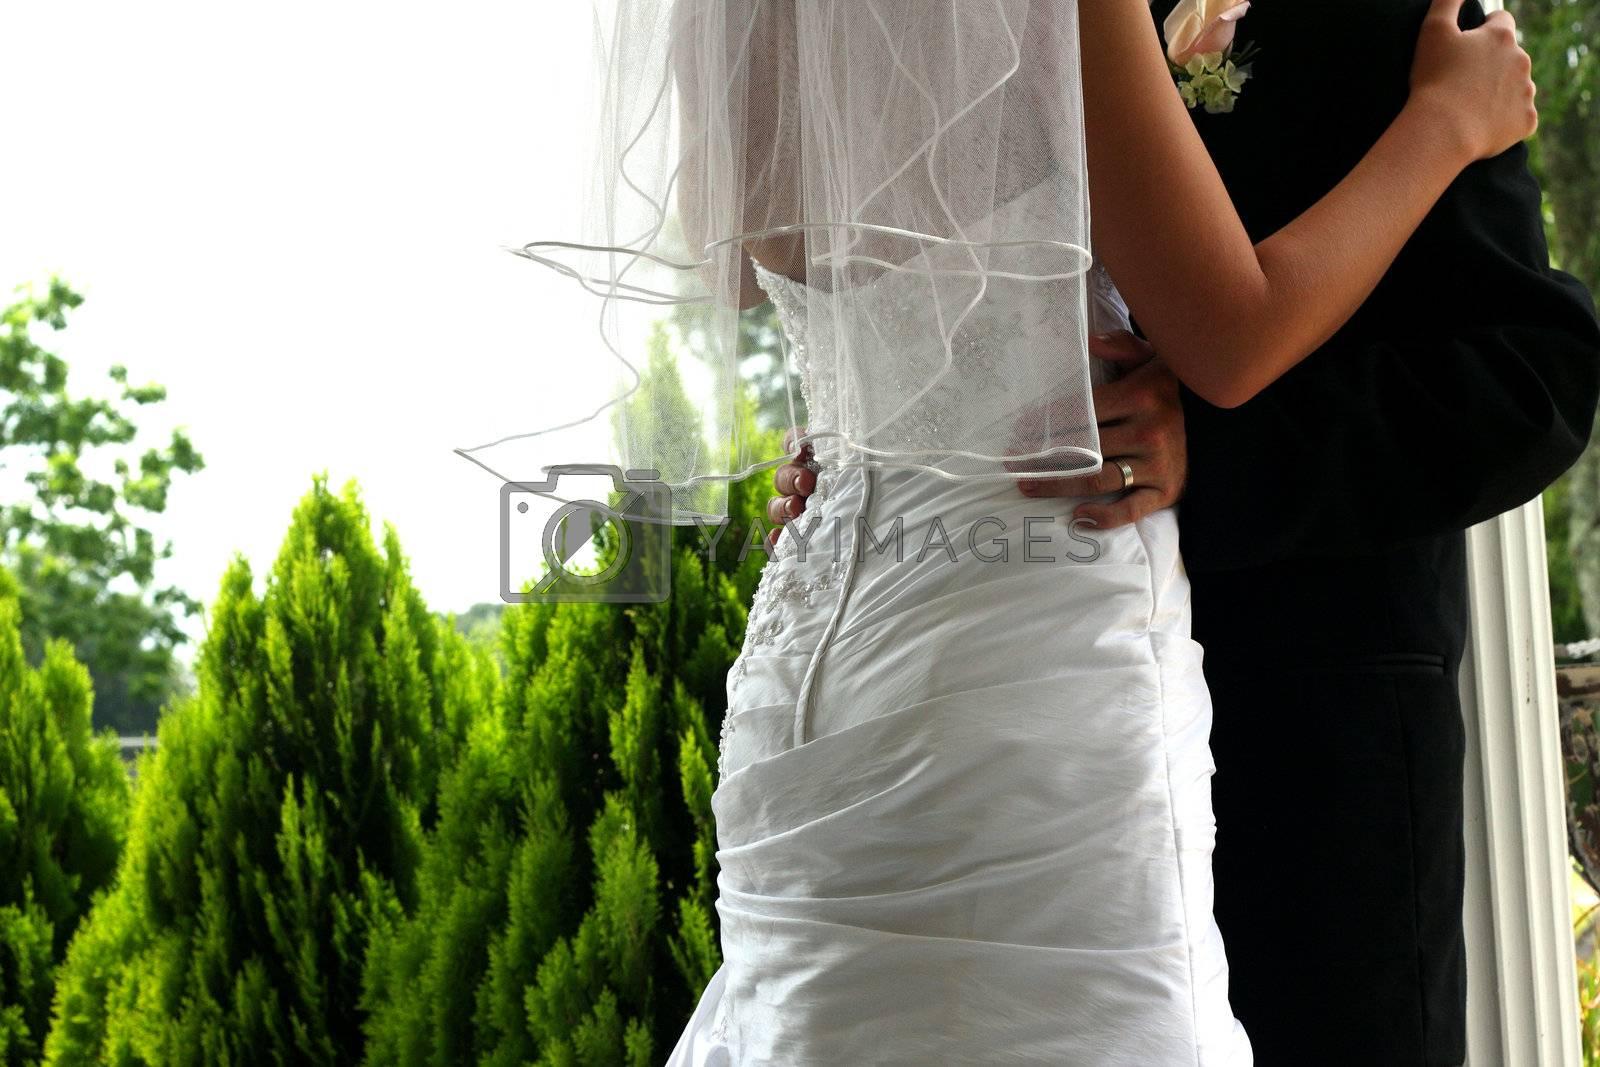 Royalty free image of Wedding Day by leyelliott